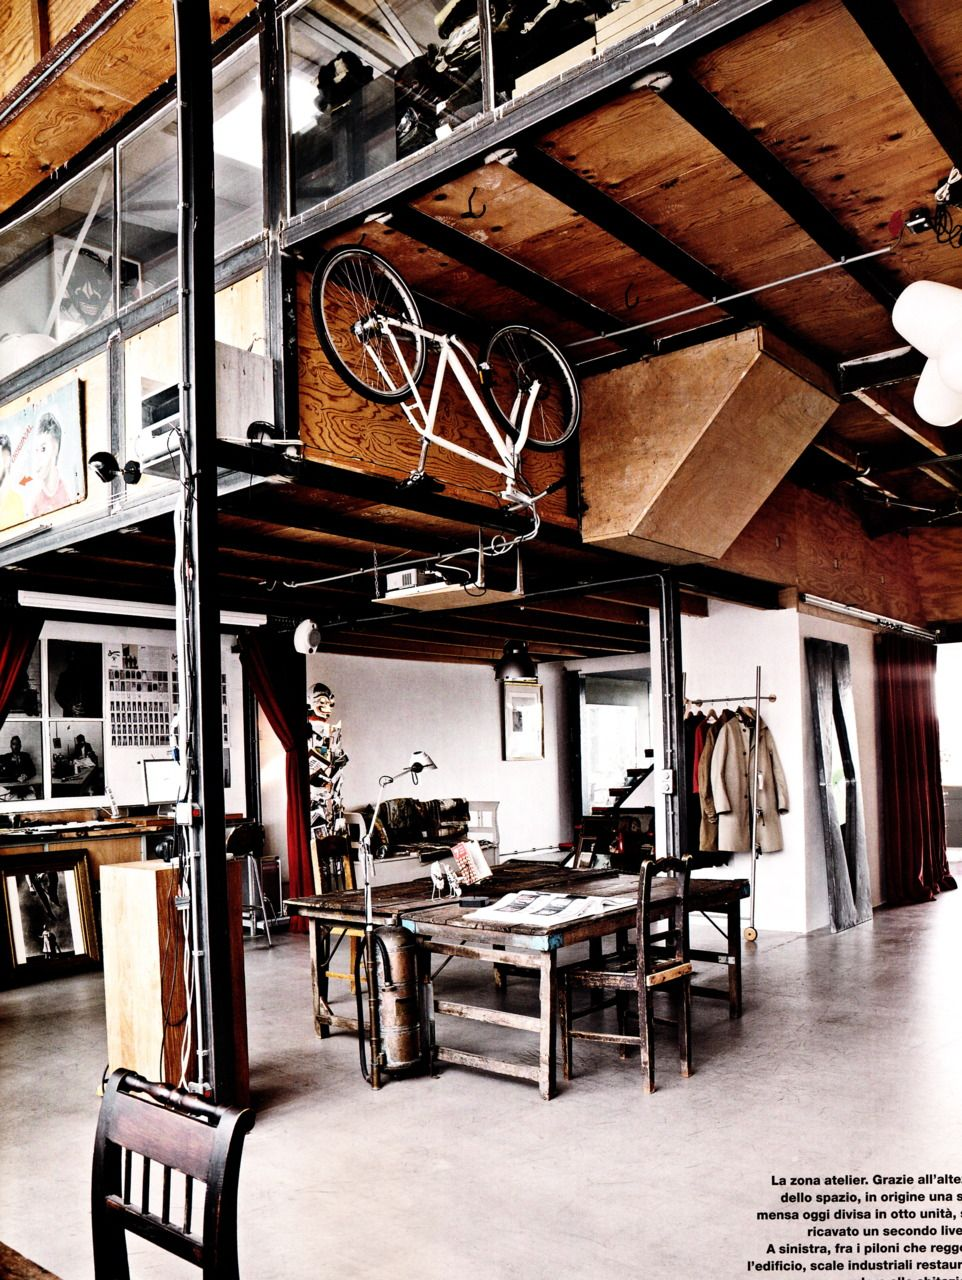 Spazio Italiano San Francisco industrial | ロフト設計, 自宅で, インテリアアーキテクチャ